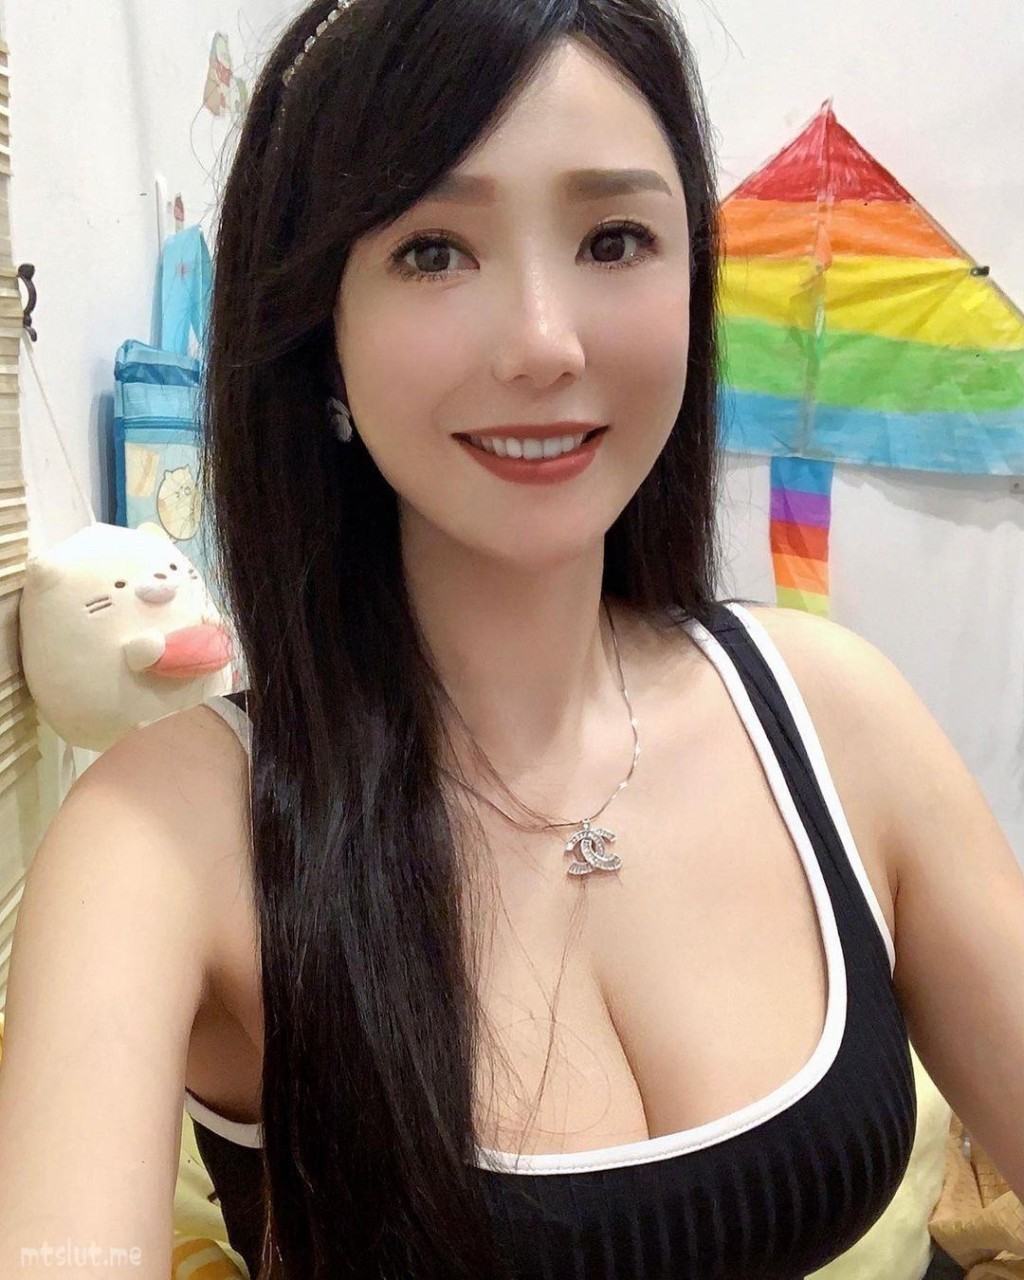 ins妹子图-精选-20210509